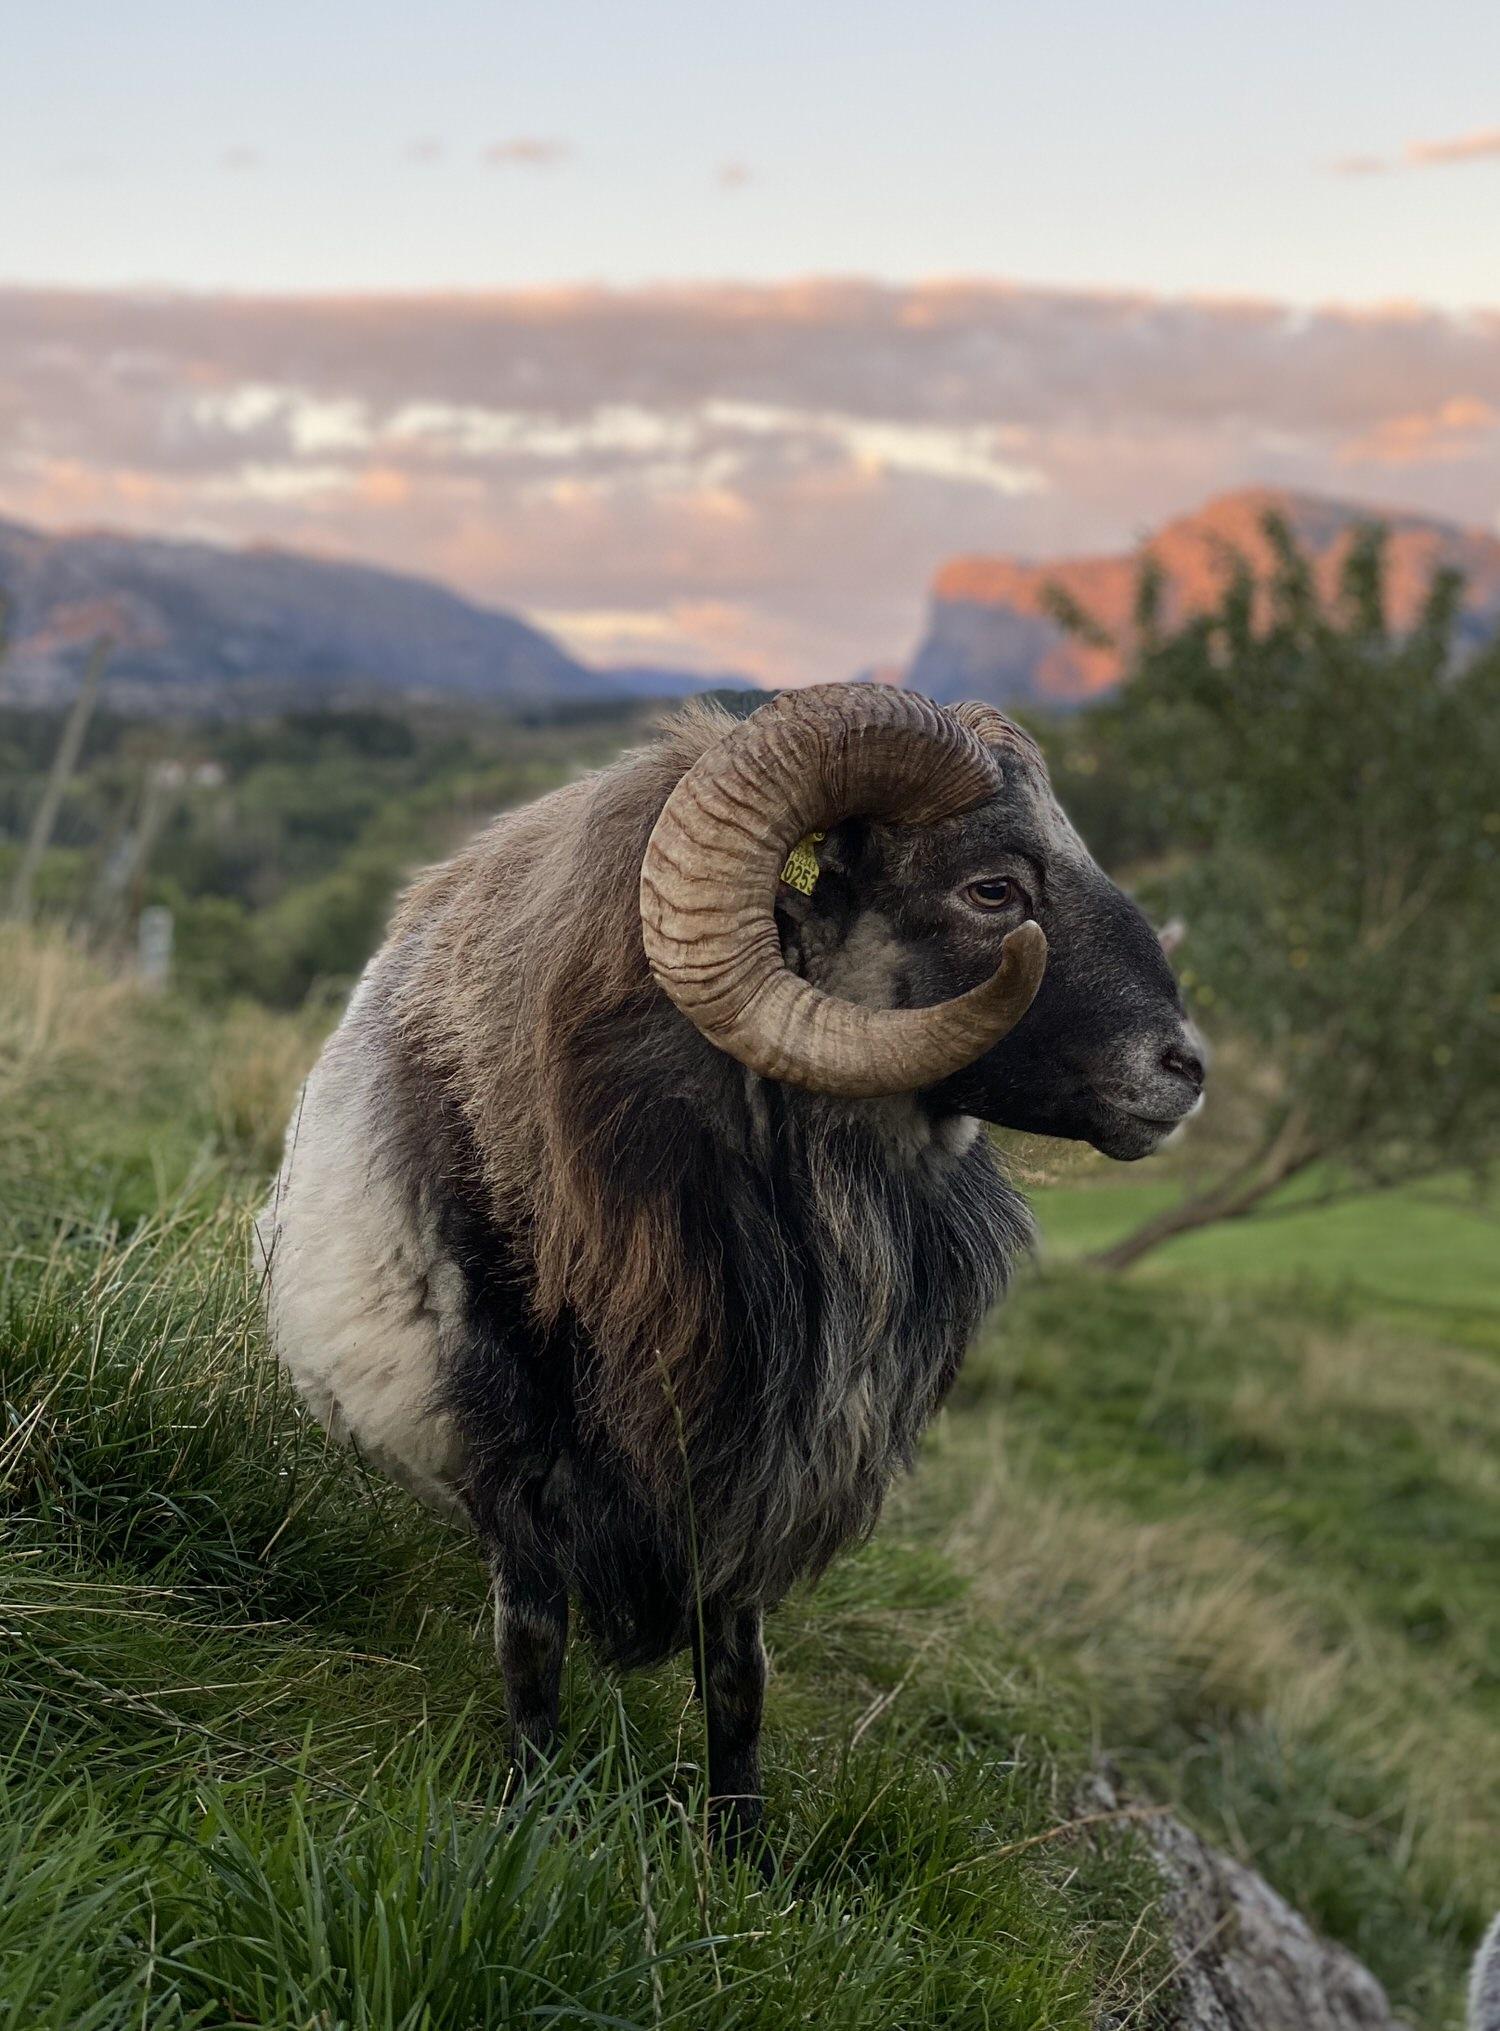 Stylecraft Eikund Production Norweigan Sheep Yellowtrace 14